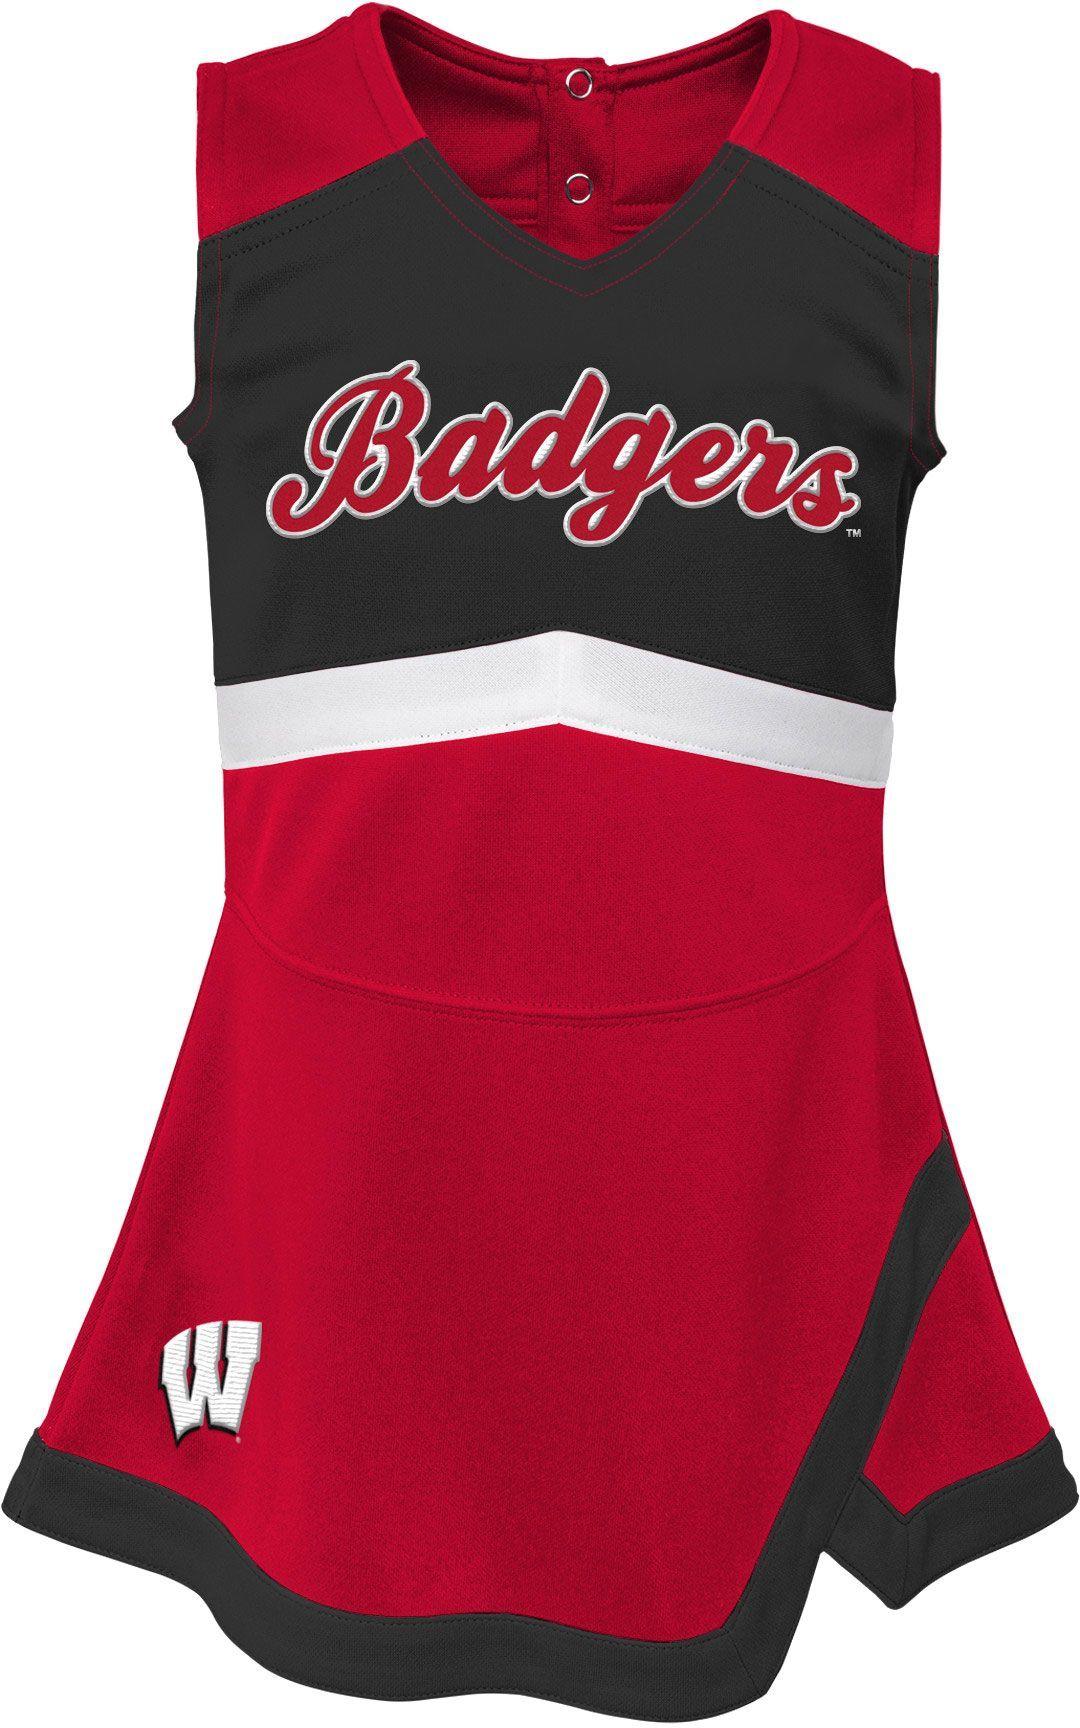 0fdc7048529 Outerstuff Girls' Wisconsin Badgers REd Cheer Captain 2-Piece Jumper Dress